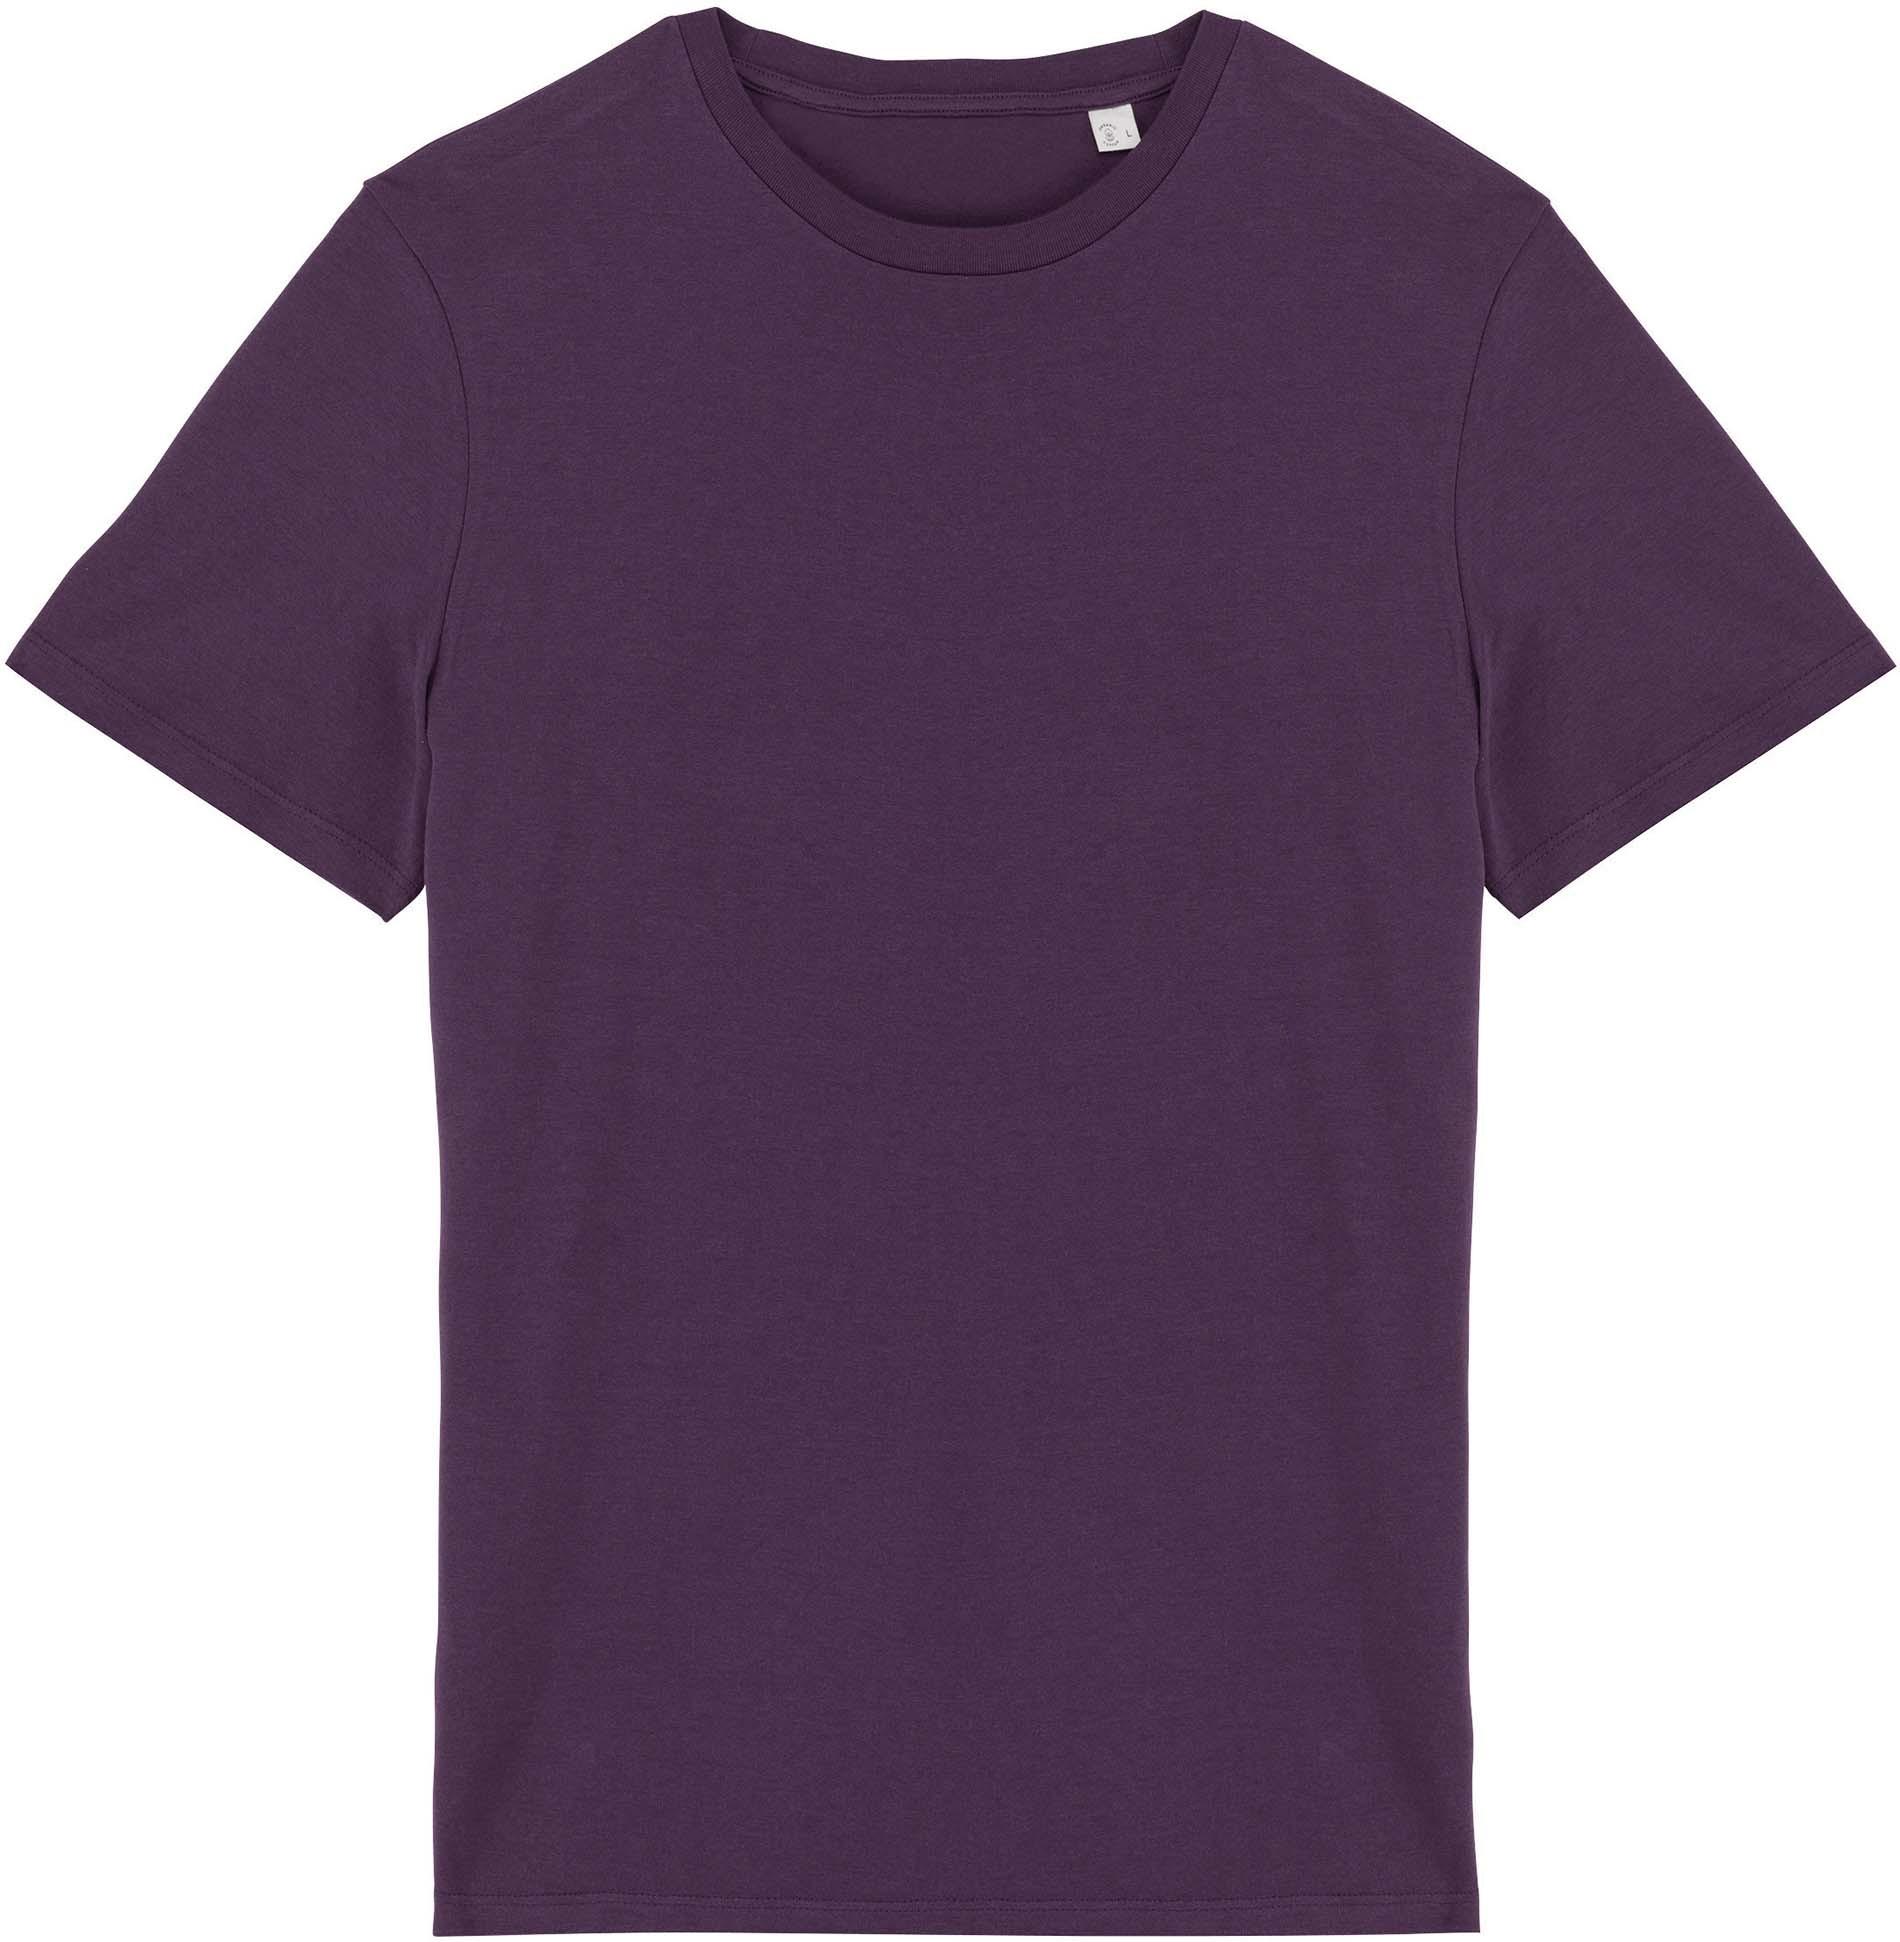 Tee-shirt manches courtes unisexe - 2-1843-24